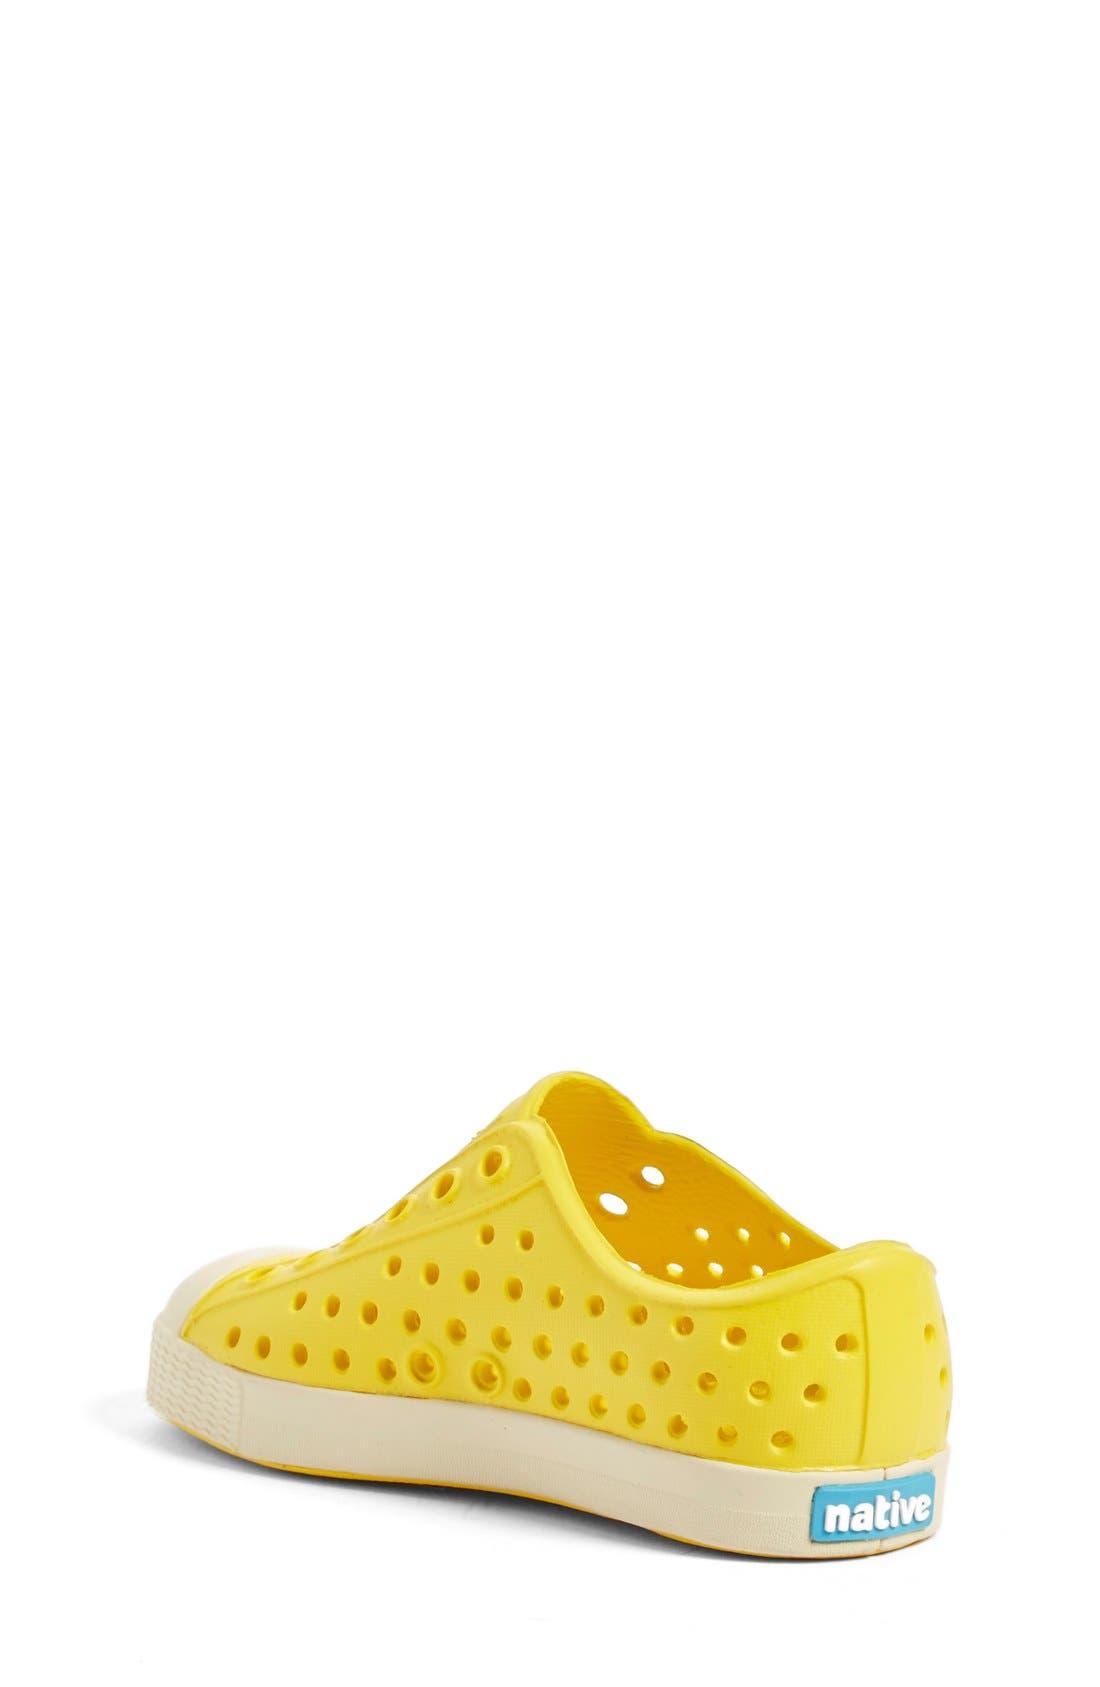 'Jefferson' Water Friendly Slip-On Sneaker,                             Alternate thumbnail 168, color,